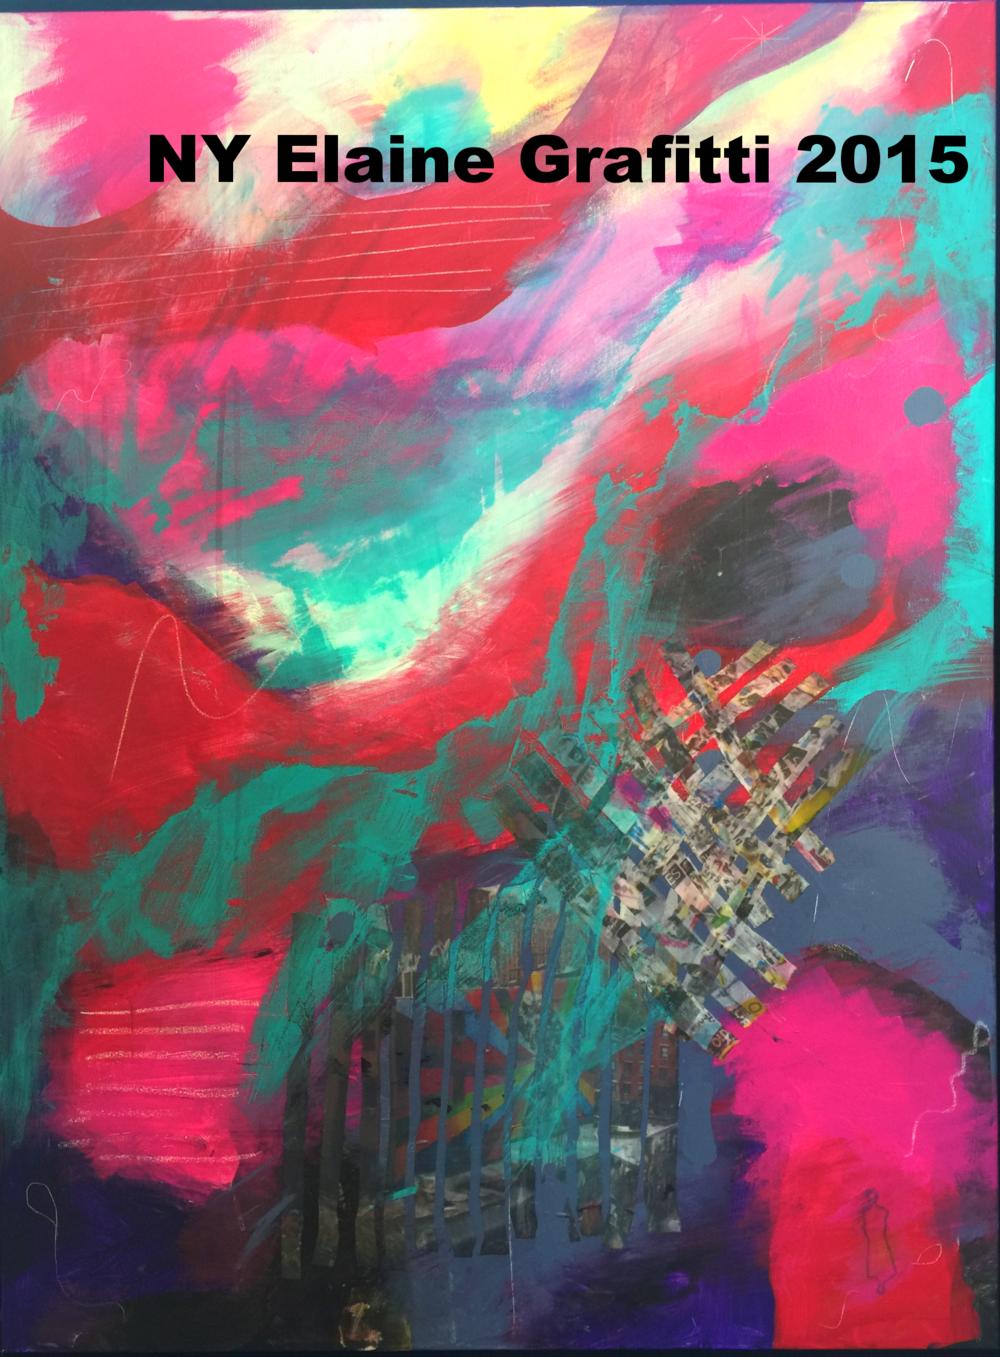 NY Elaine Grafitti 2015